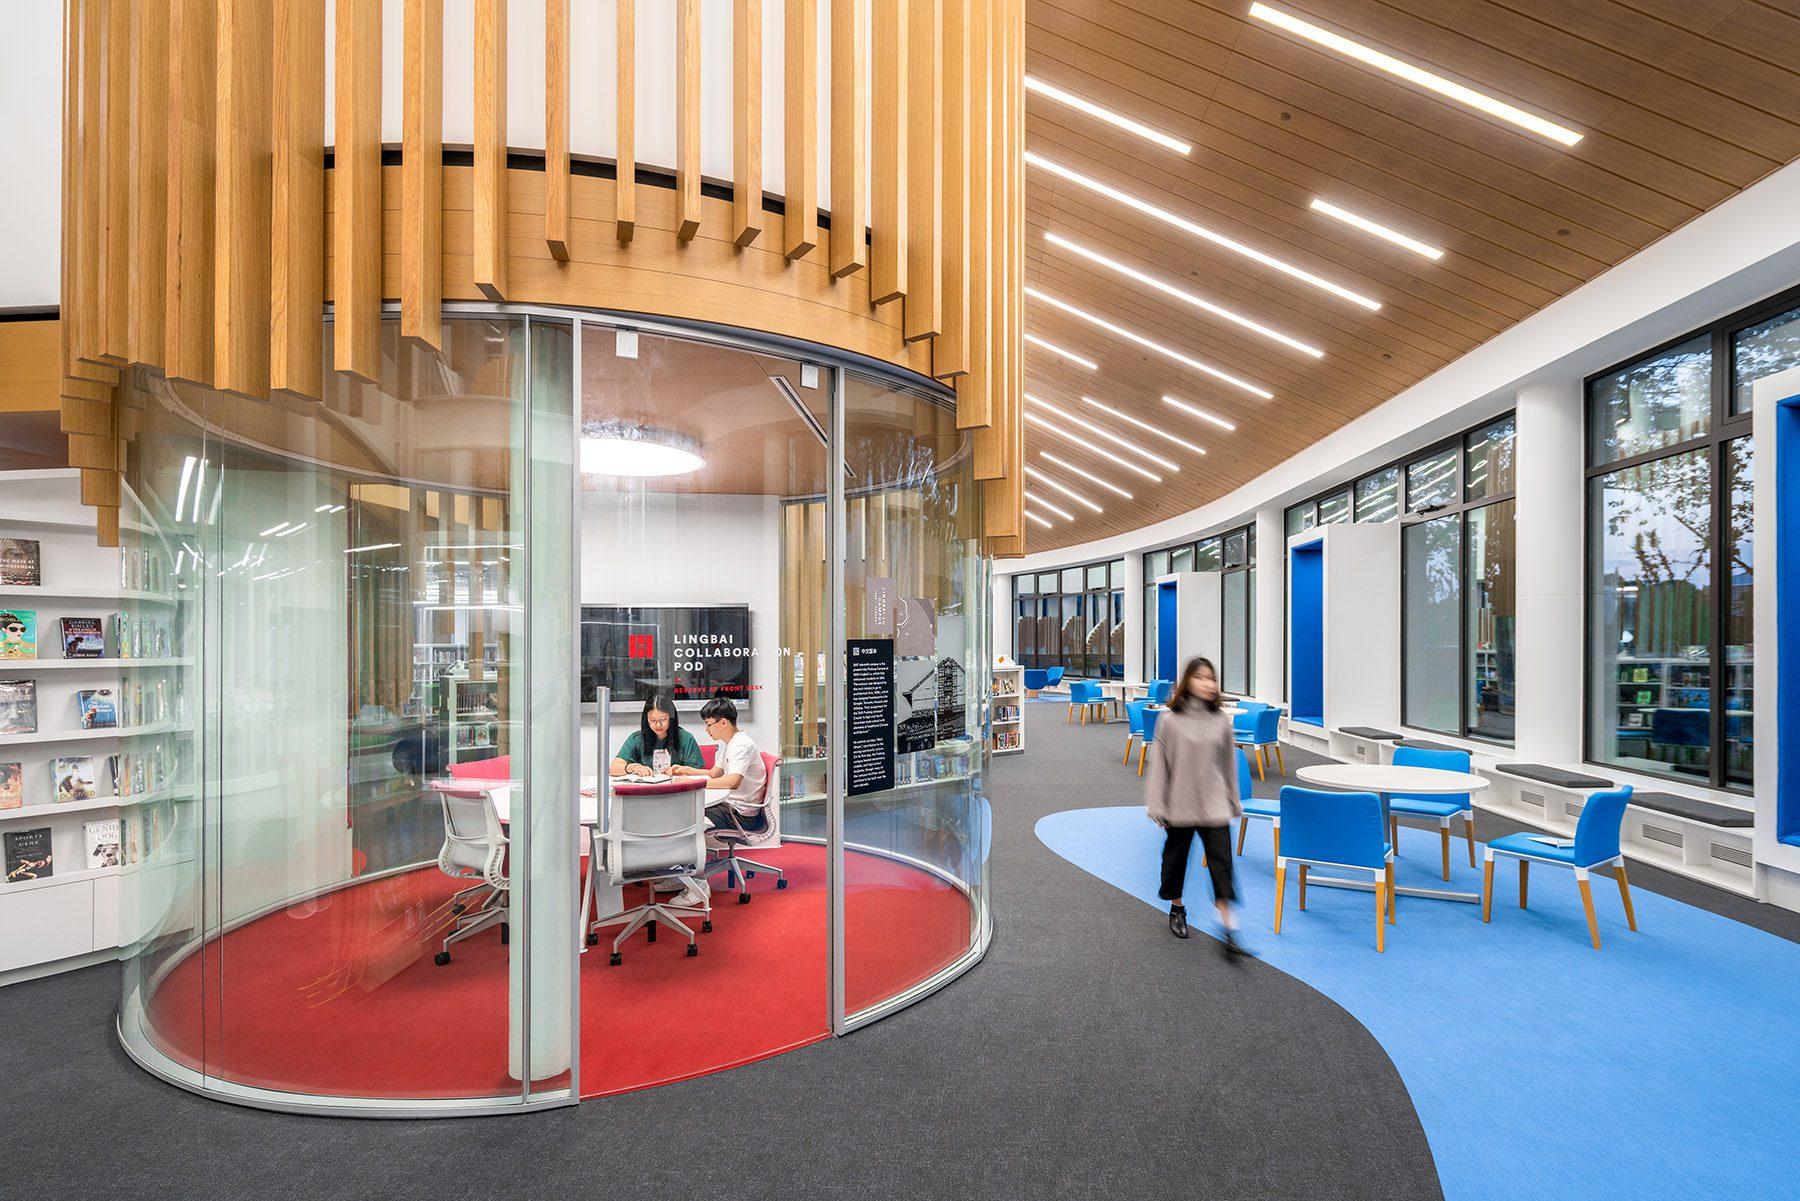 Shanghai American School Puxi Campus Library